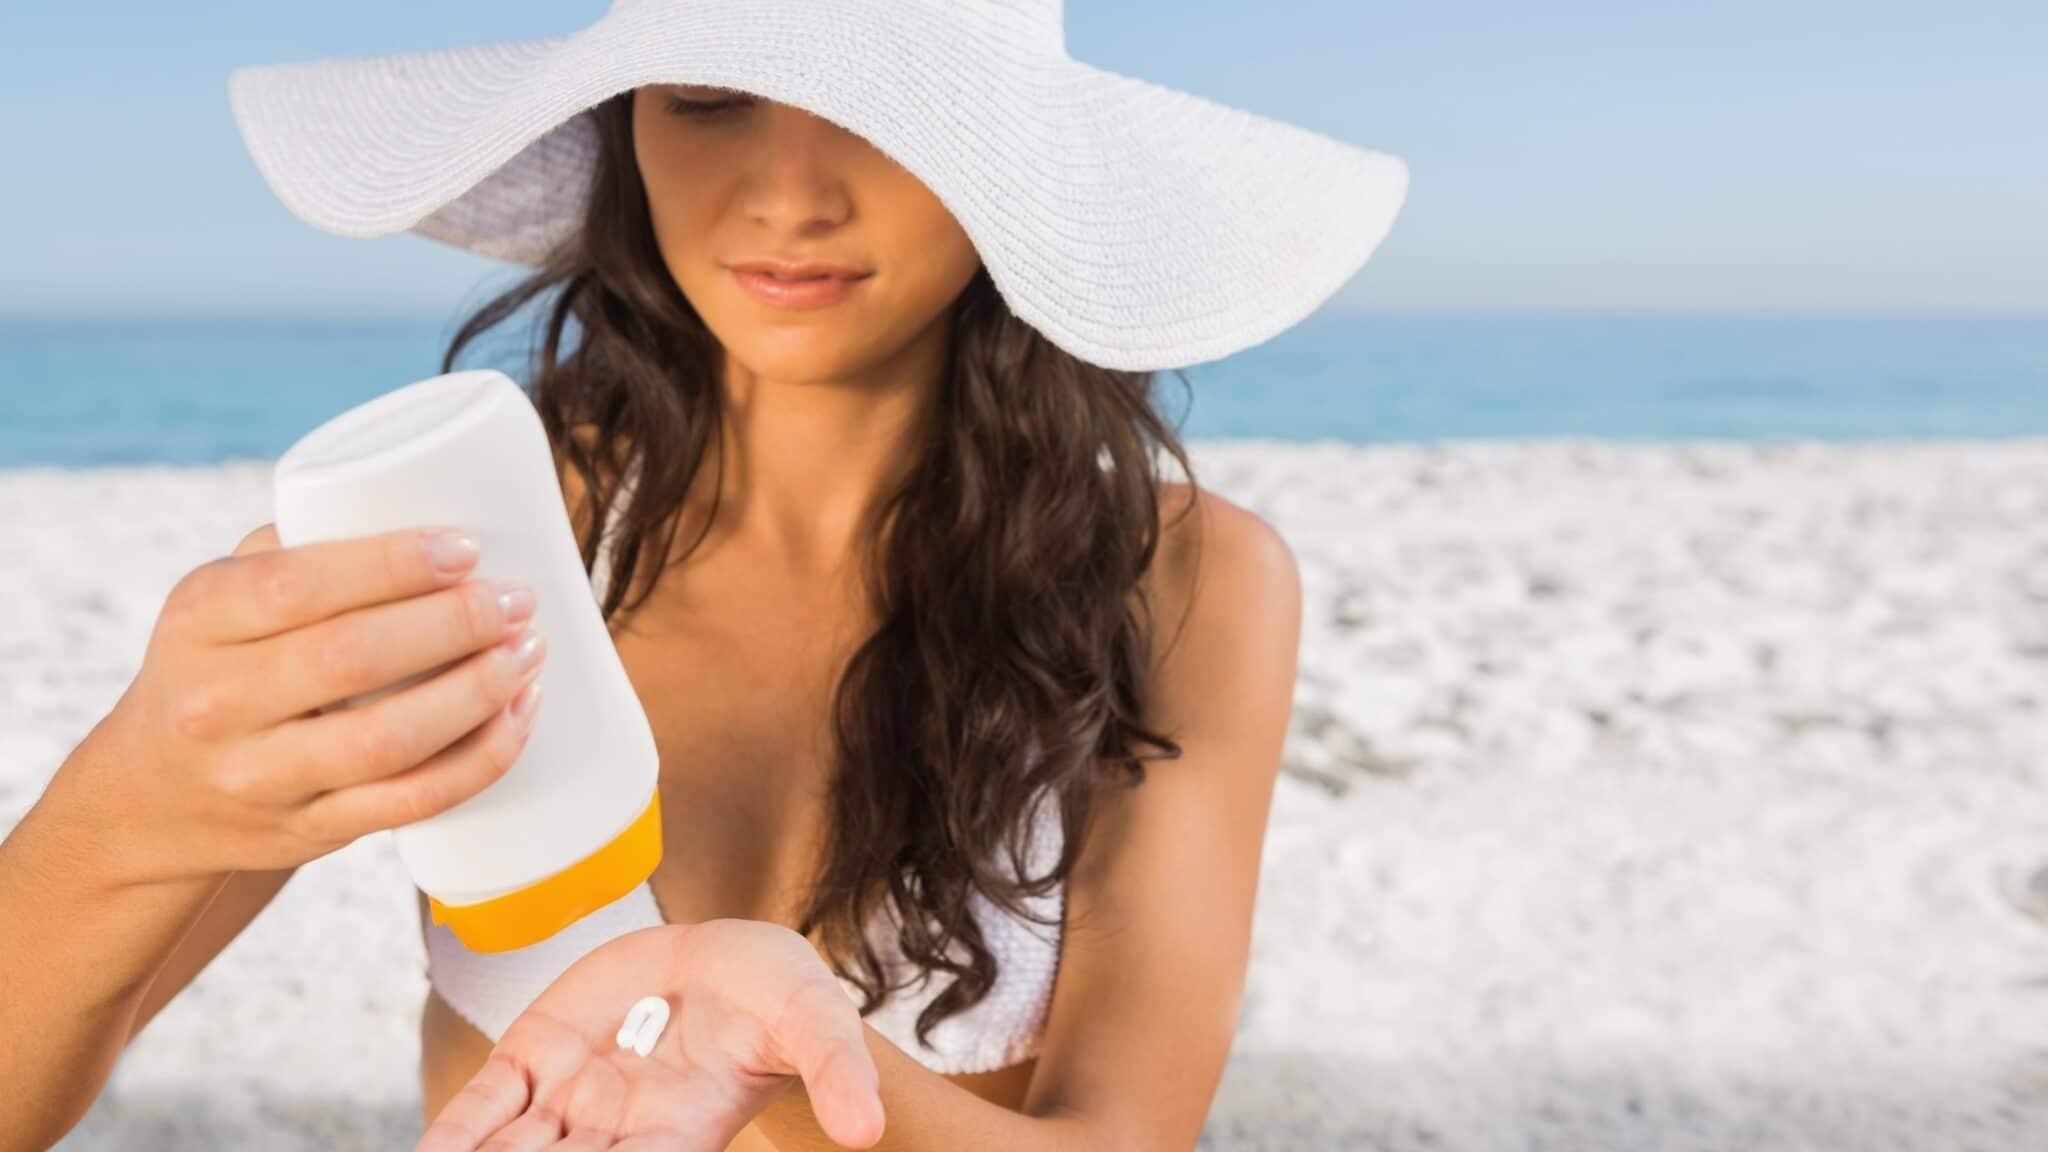 woman applying suncream to hand scaled